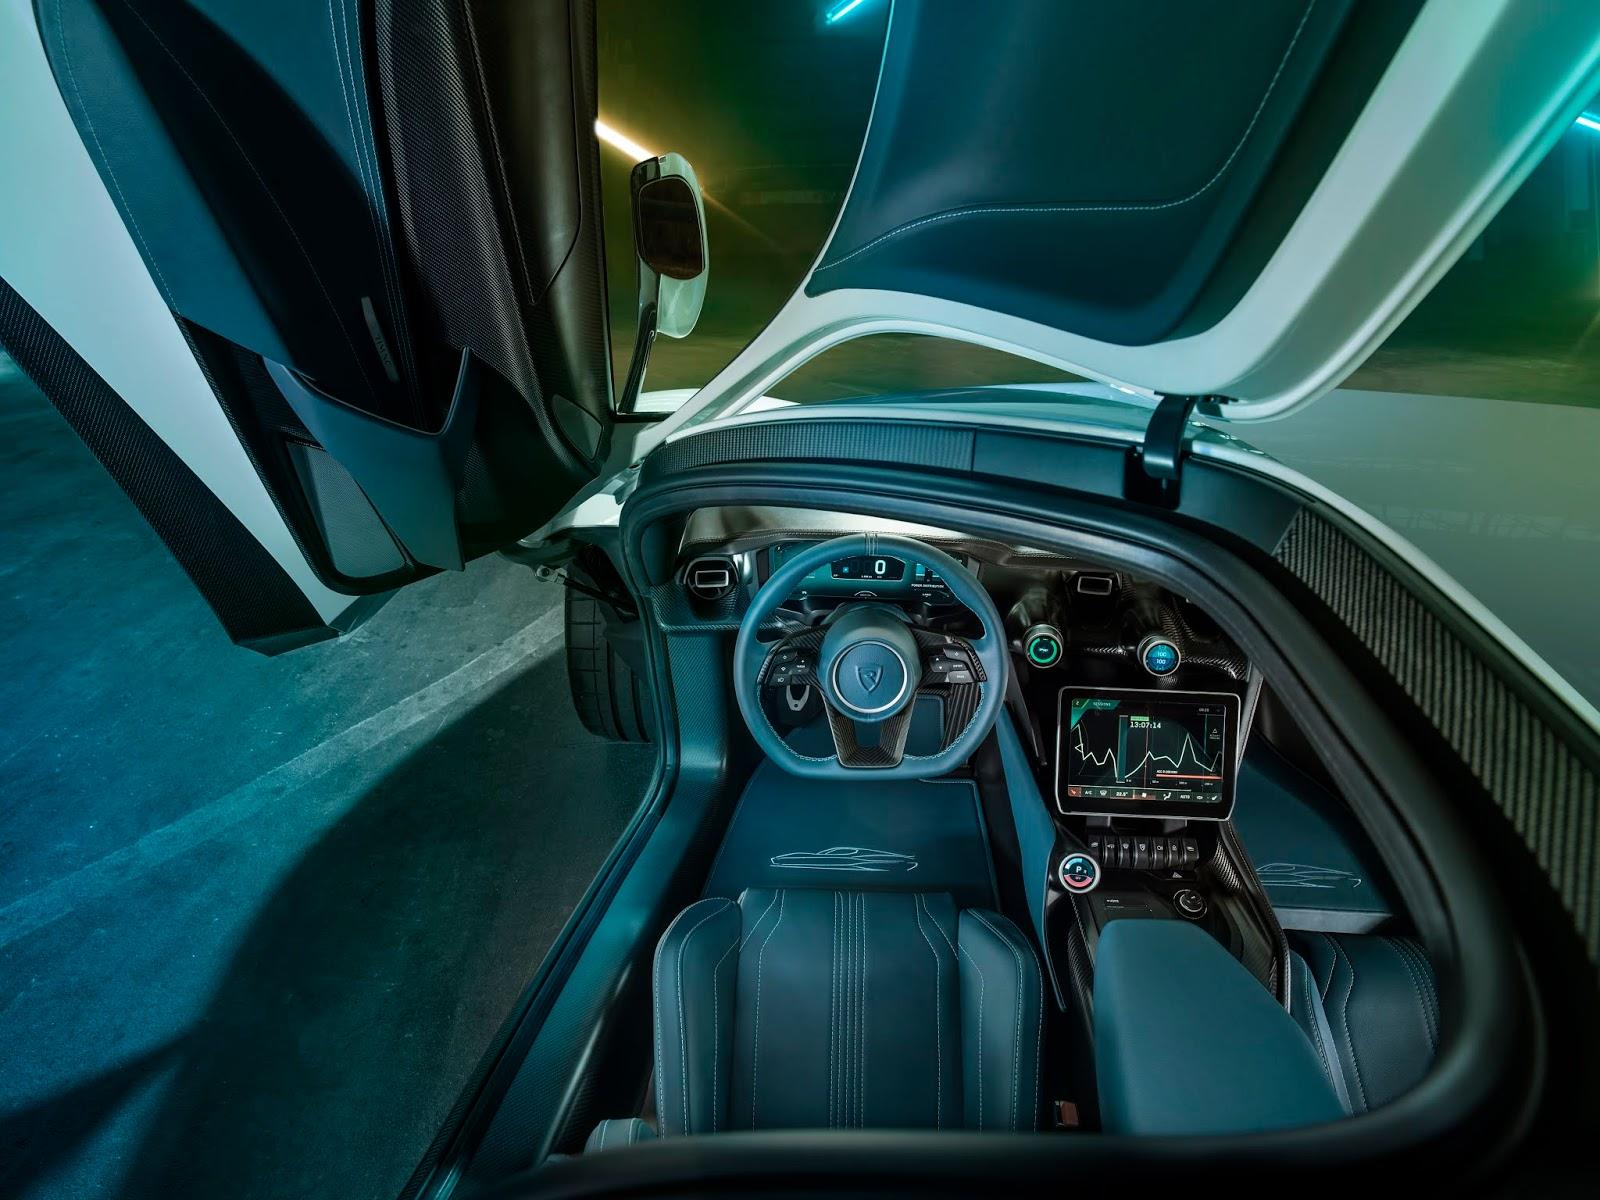 C TWO Interior POV Rimac C Two. Η νέα φυλή στα hypercars, έρχεται με 1900 ίππους. C Two, Electric cars, hypercar, Rimac, zblog